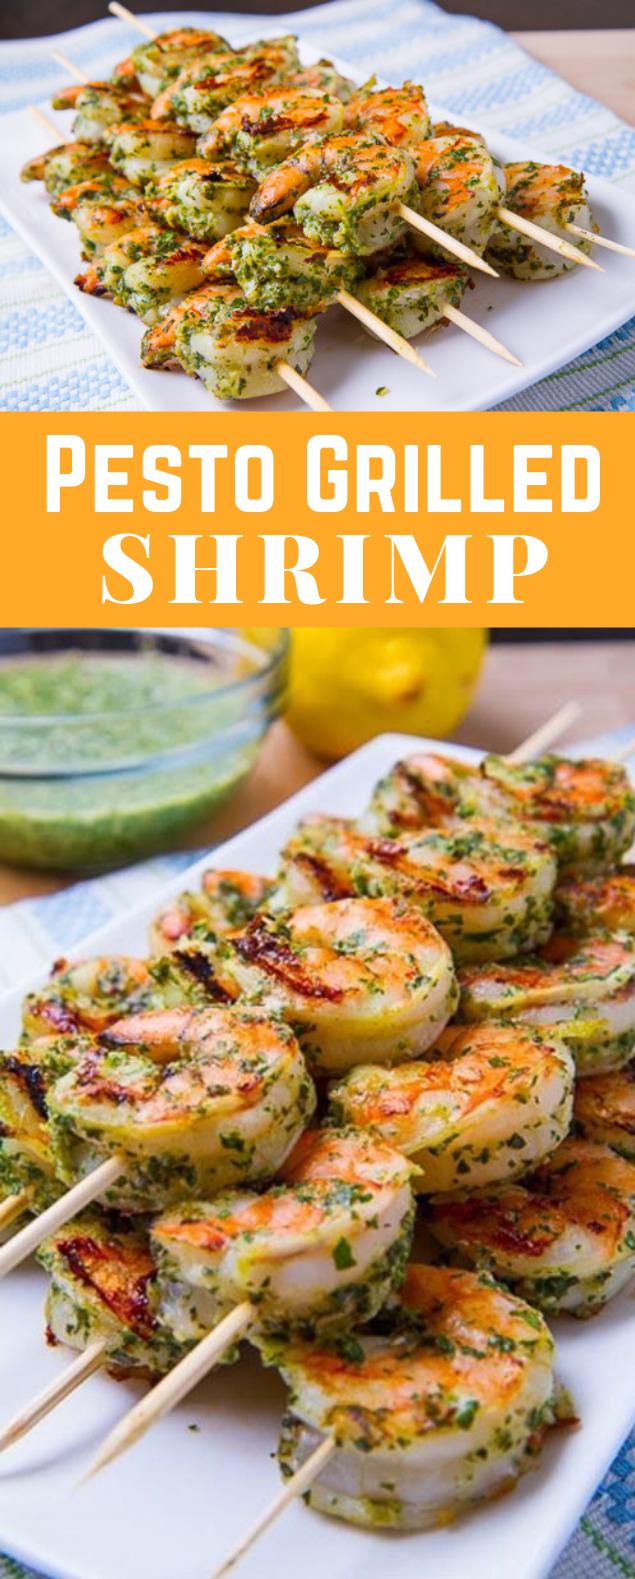 Pesto Grilled Shrimp #BBQ #Weeknight